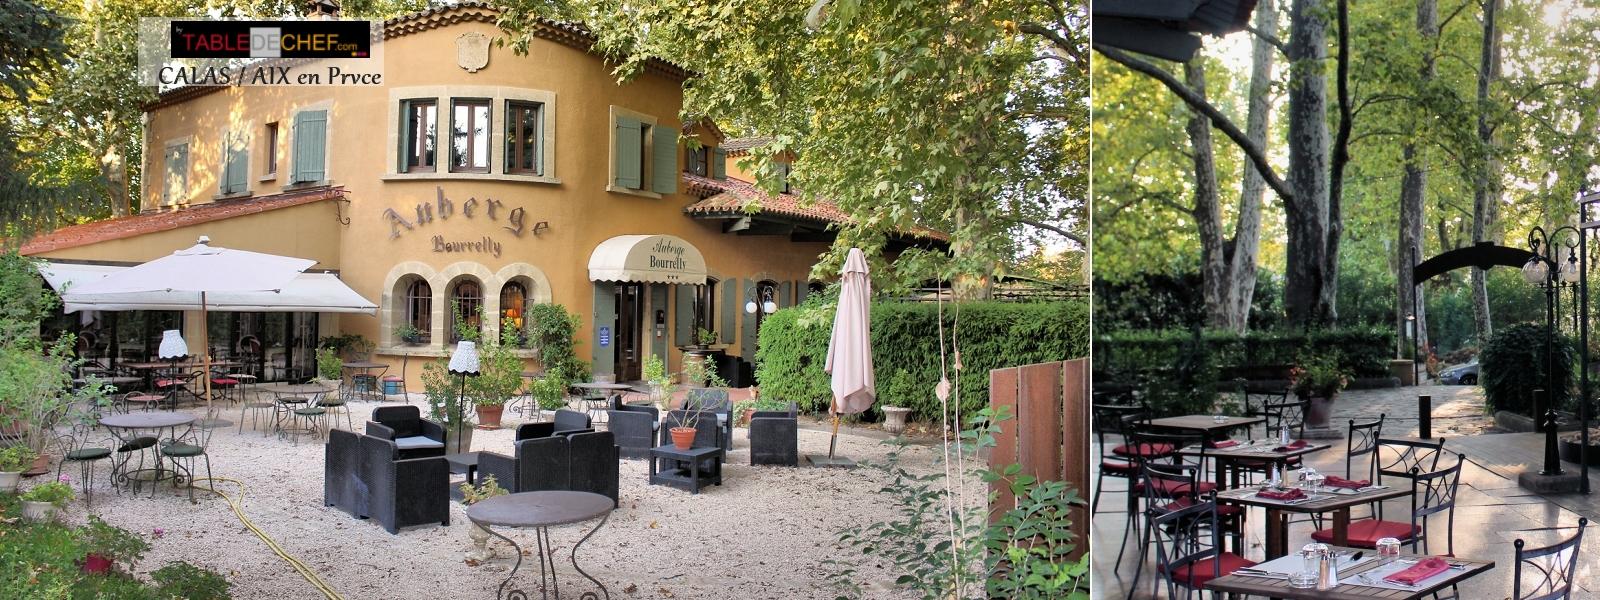 Auberge Bourrelly restaurant Calas pays d